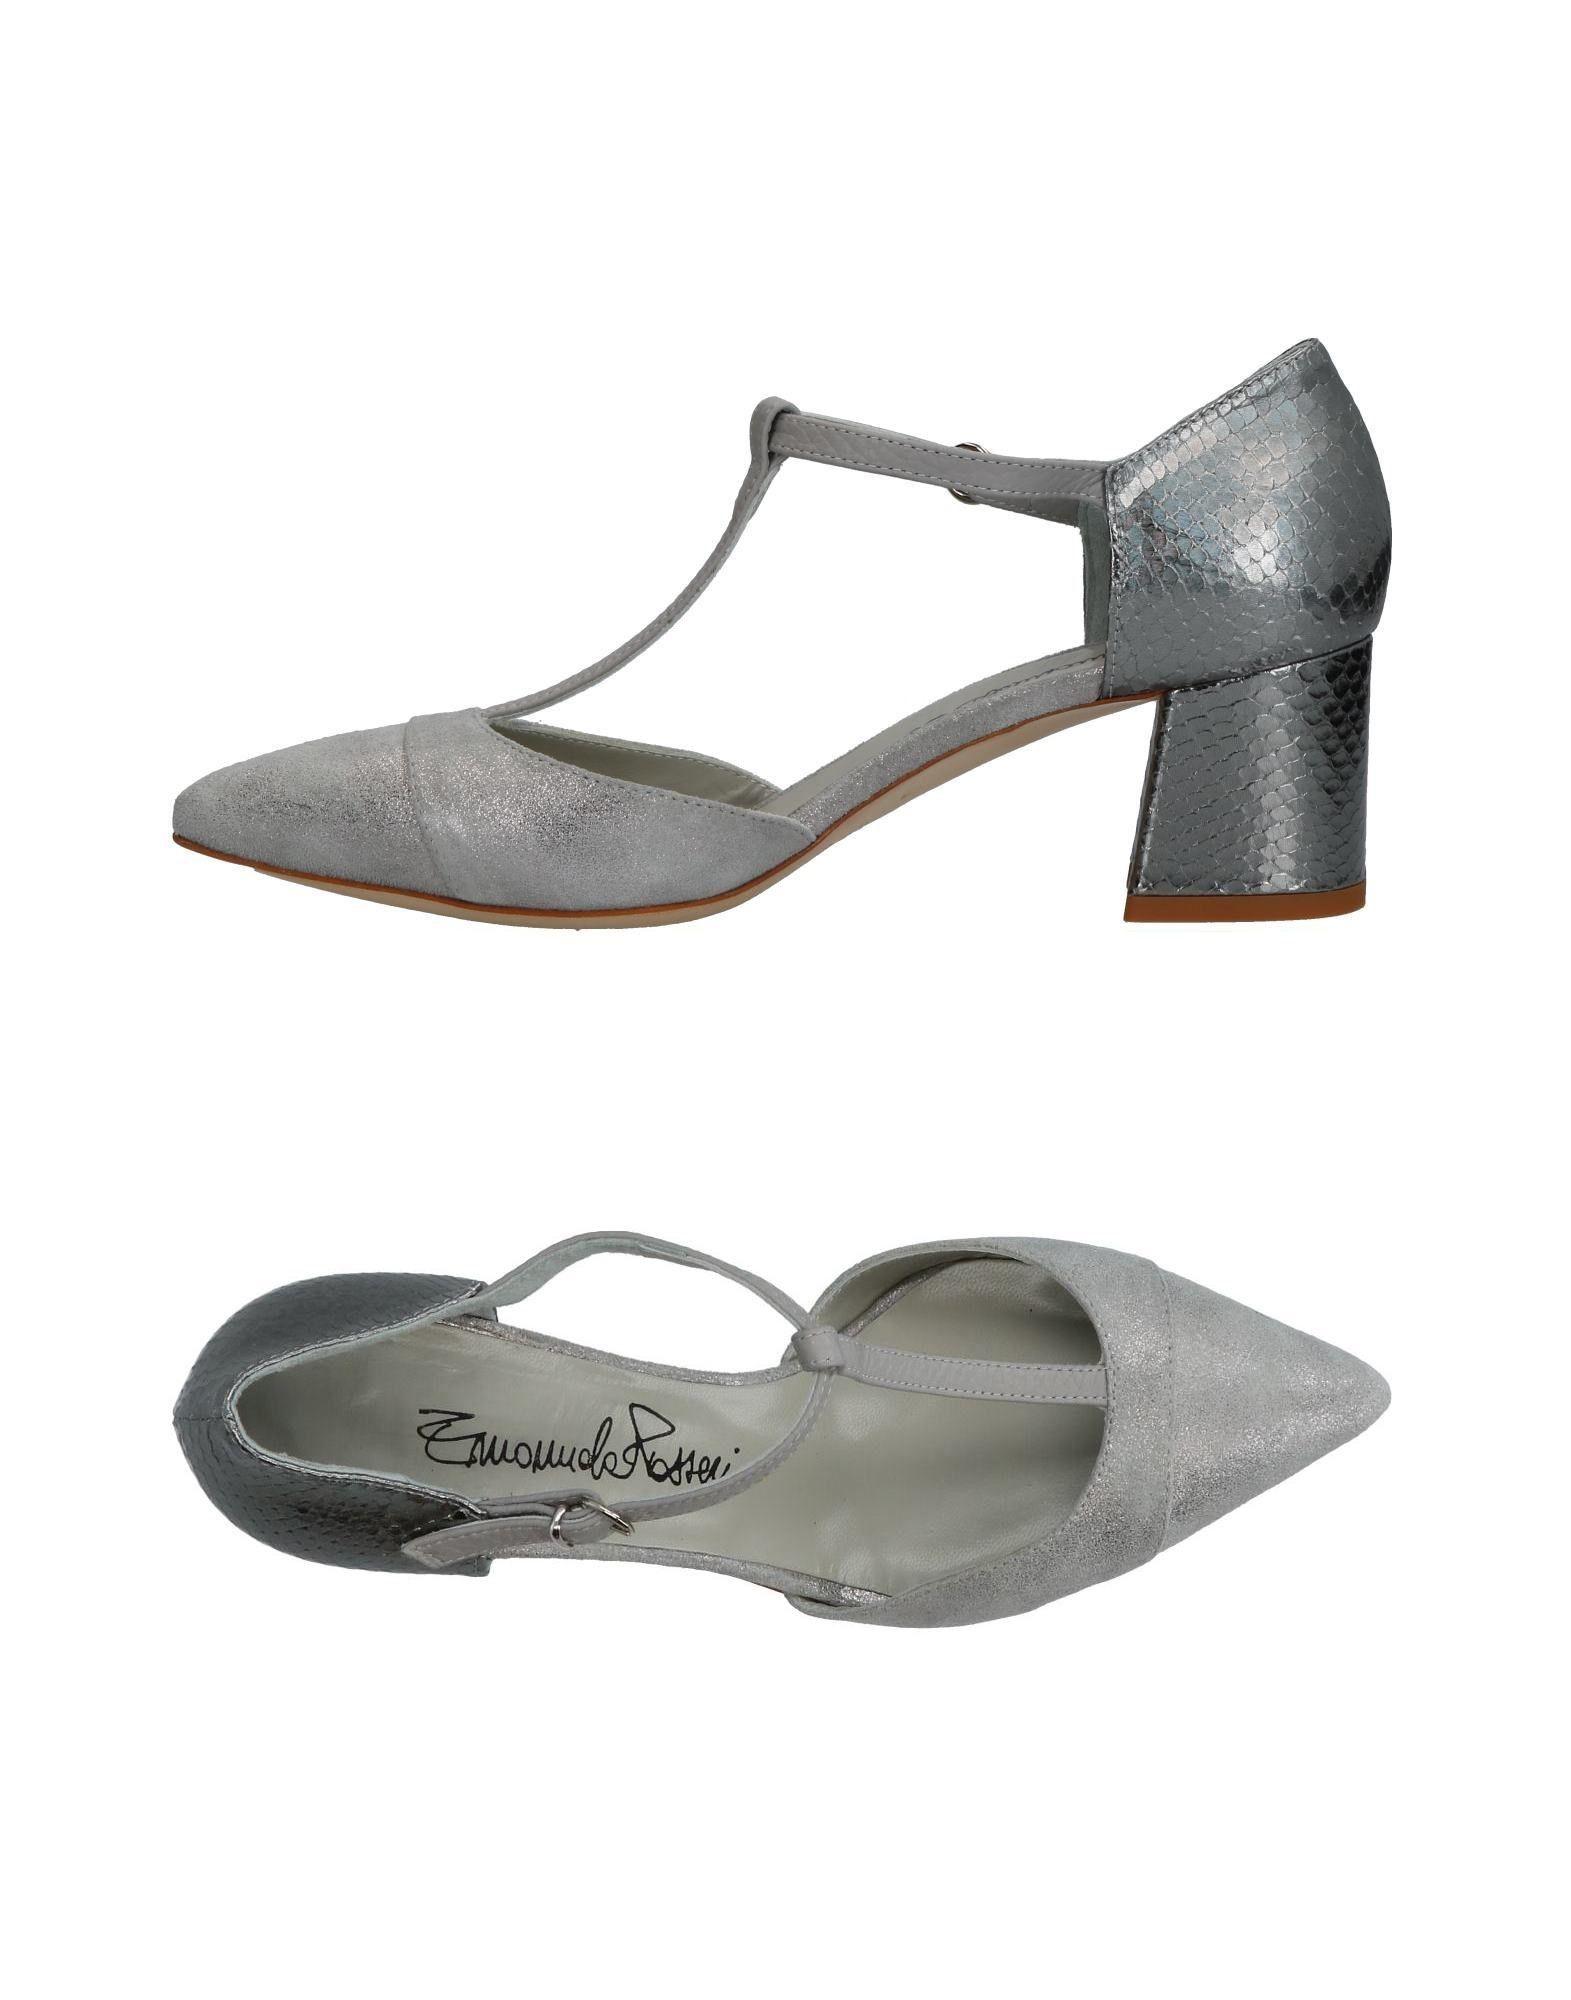 Emanuela Passeri Pumps Damen  11331723NL Gute Qualität beliebte Schuhe